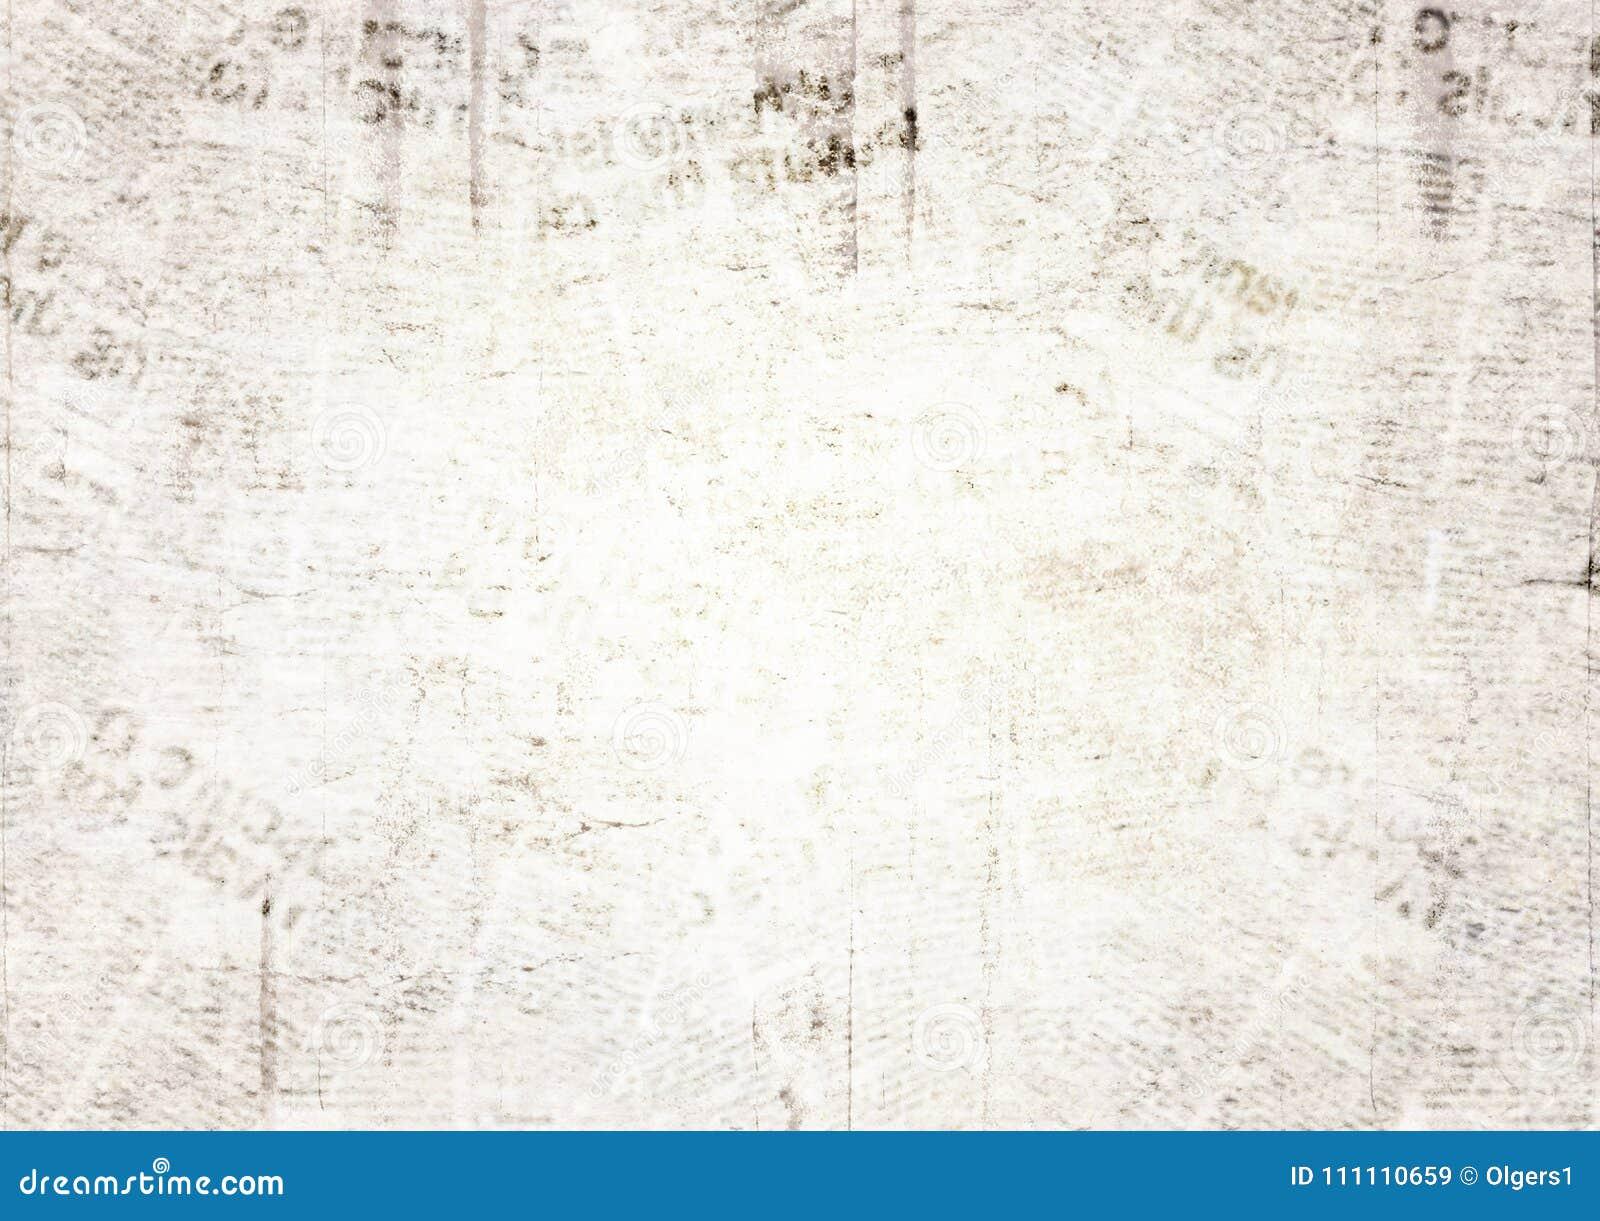 Vintage Grunge Newspaper Texture Background Stock Image